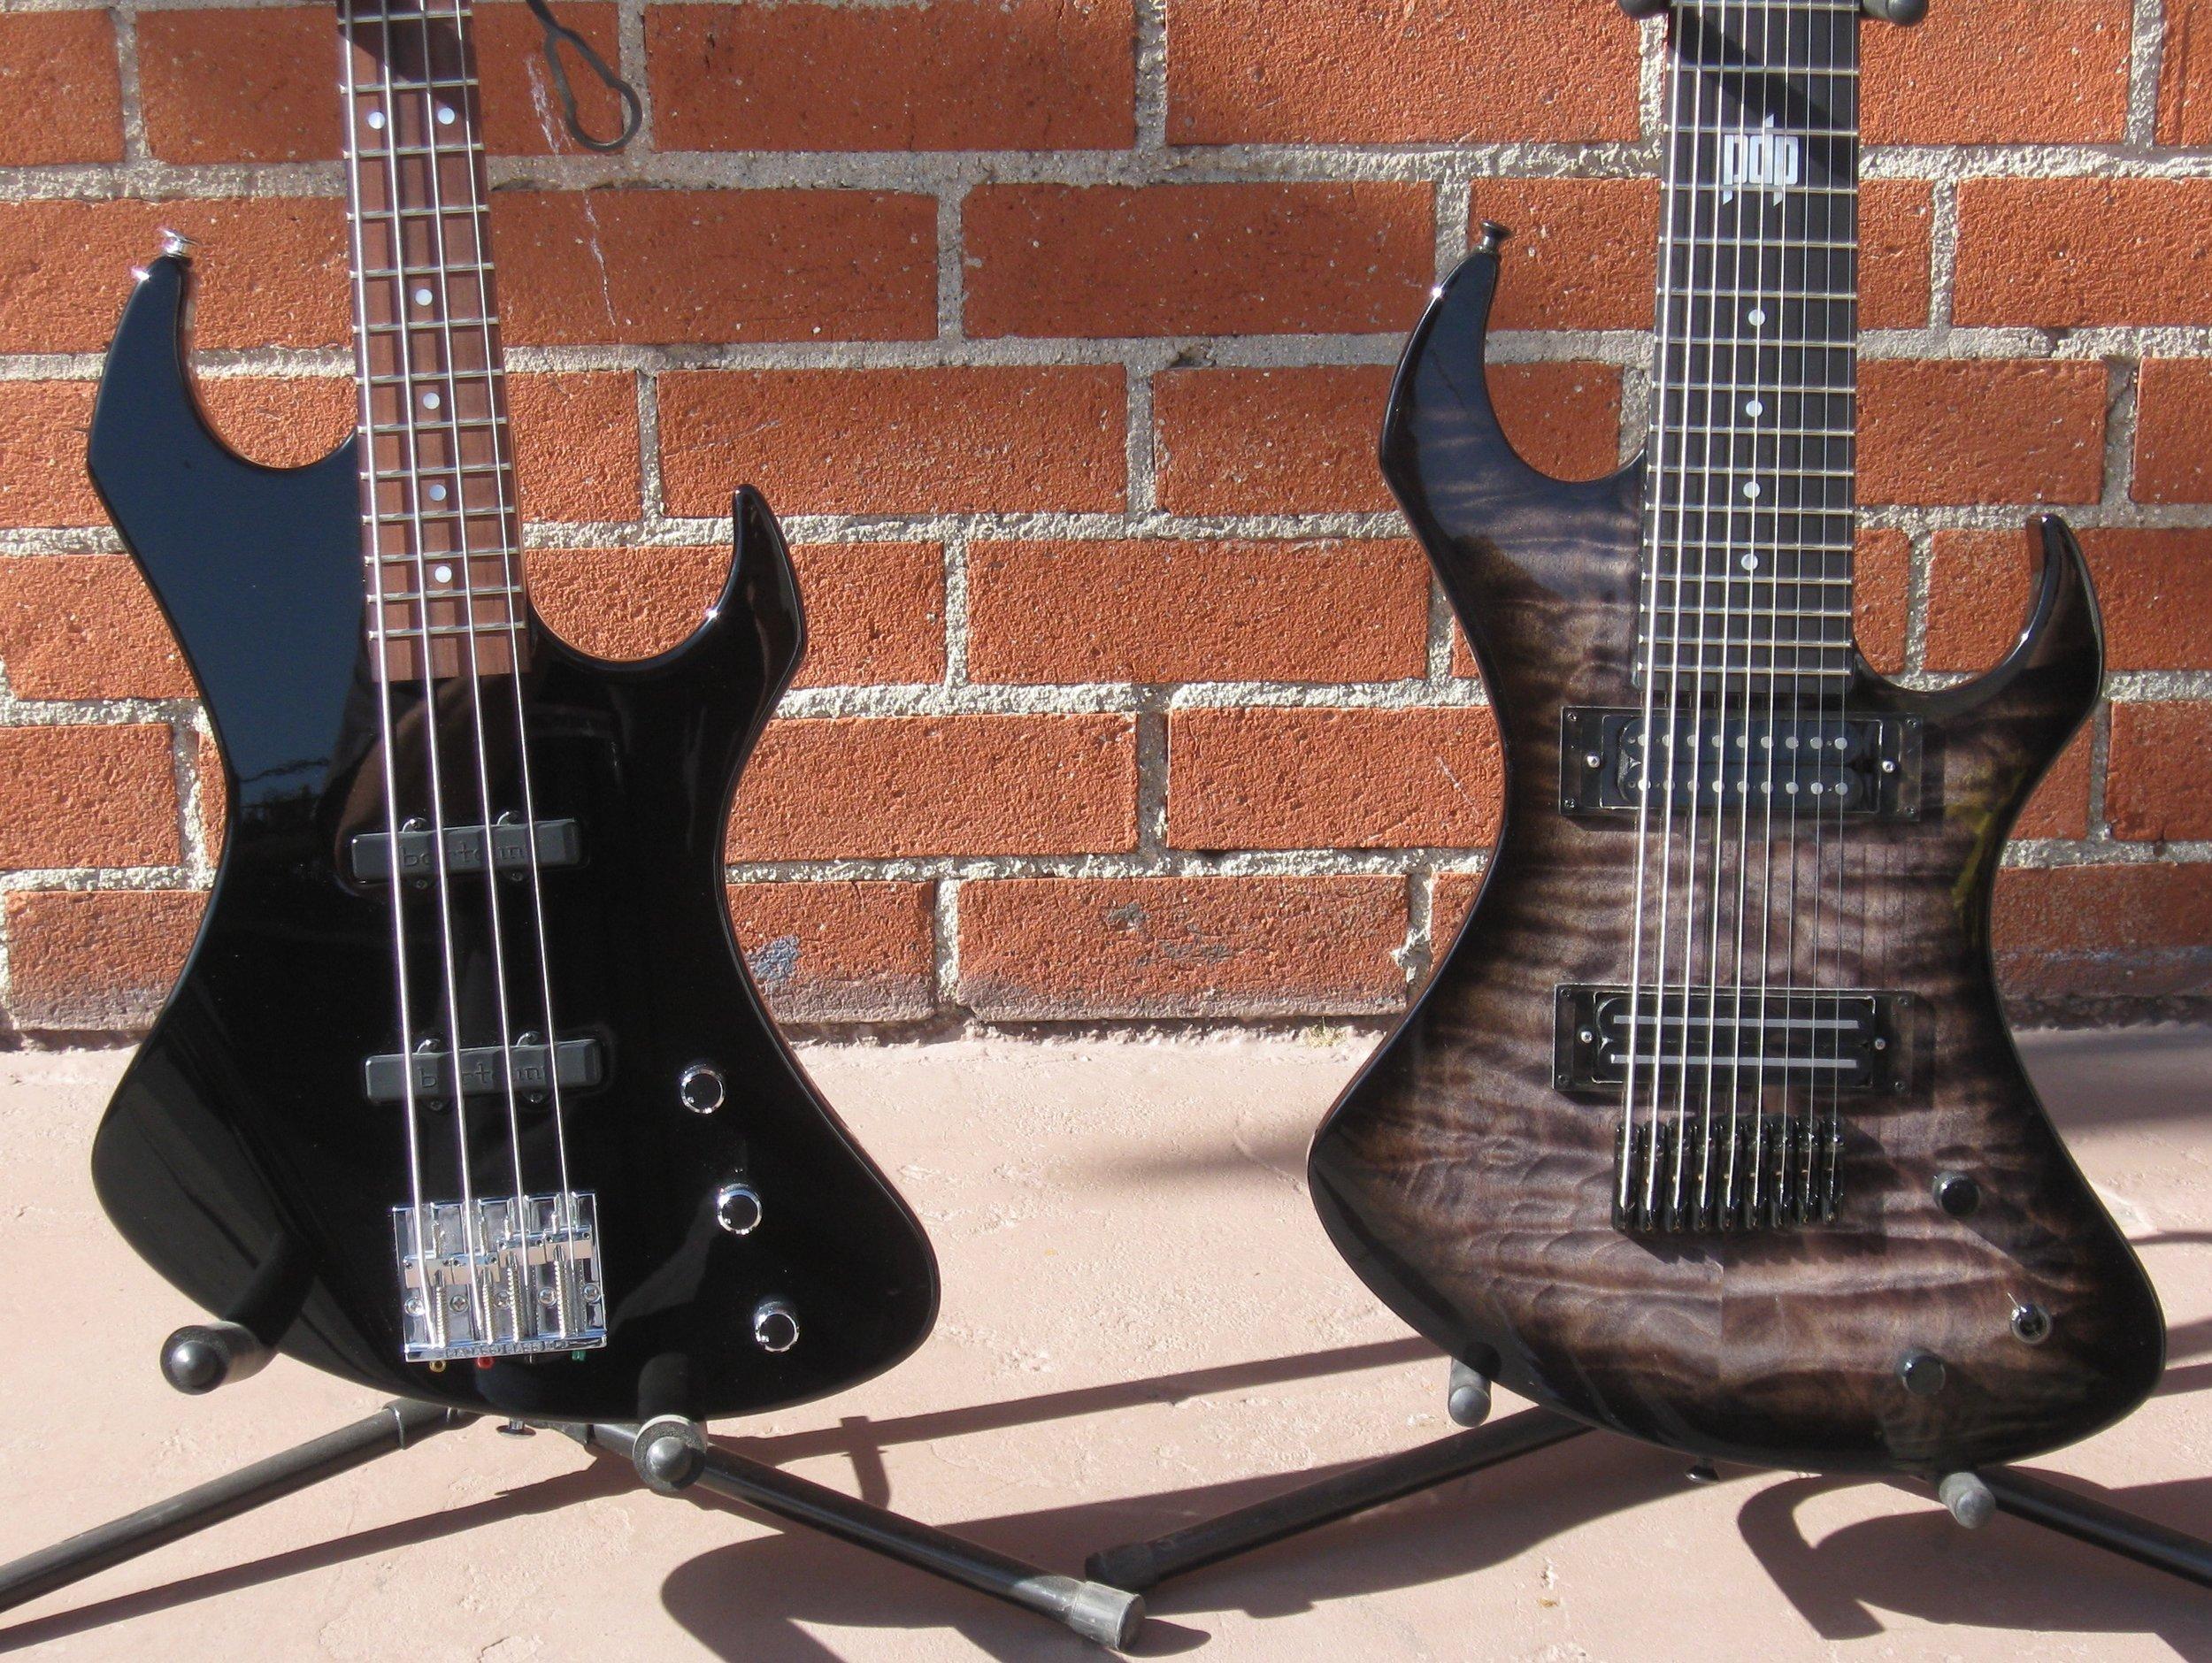 A/V bass and 9 string custom